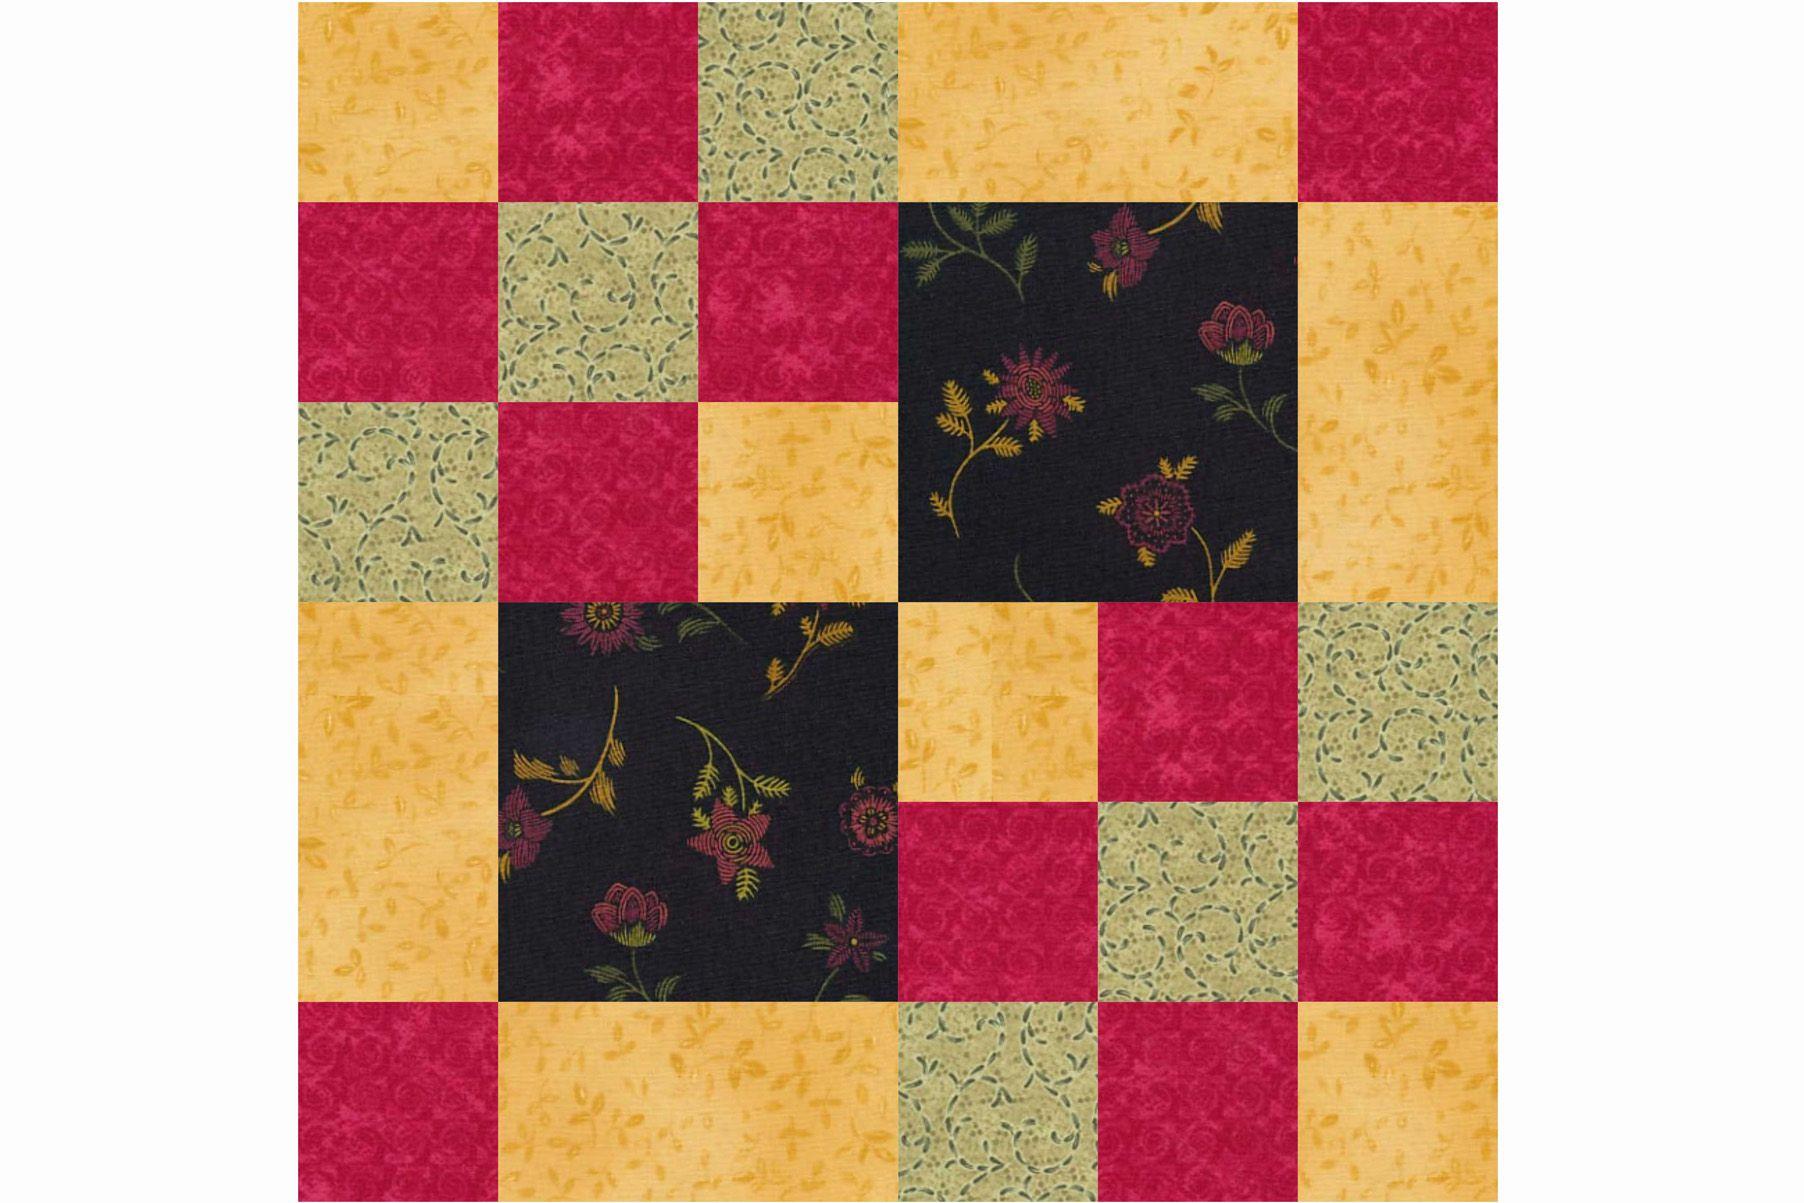 Free 9 Inch Patchwork Quilt Block Patterns